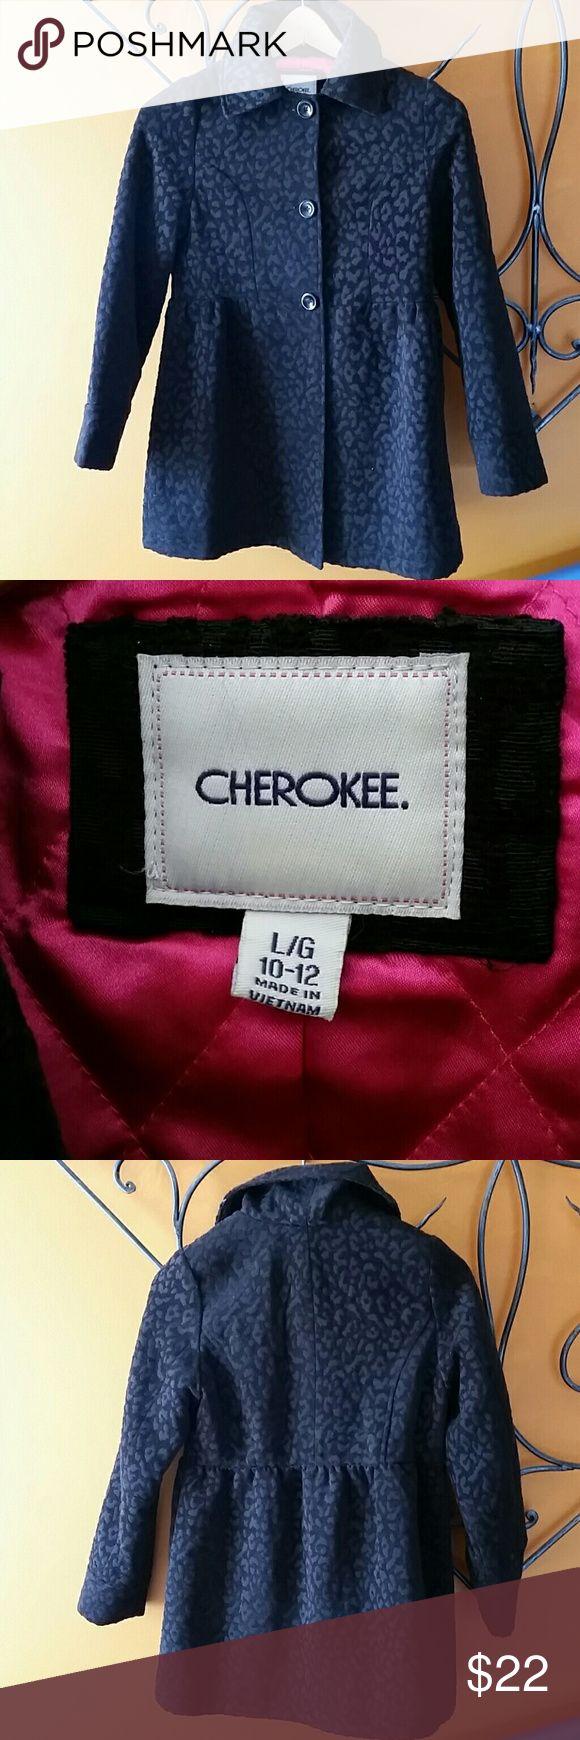 Girl peacoat Very cute coat slightly worn fit a 10/12 yrs old Cherokee Jackets & Coats Pea Coats